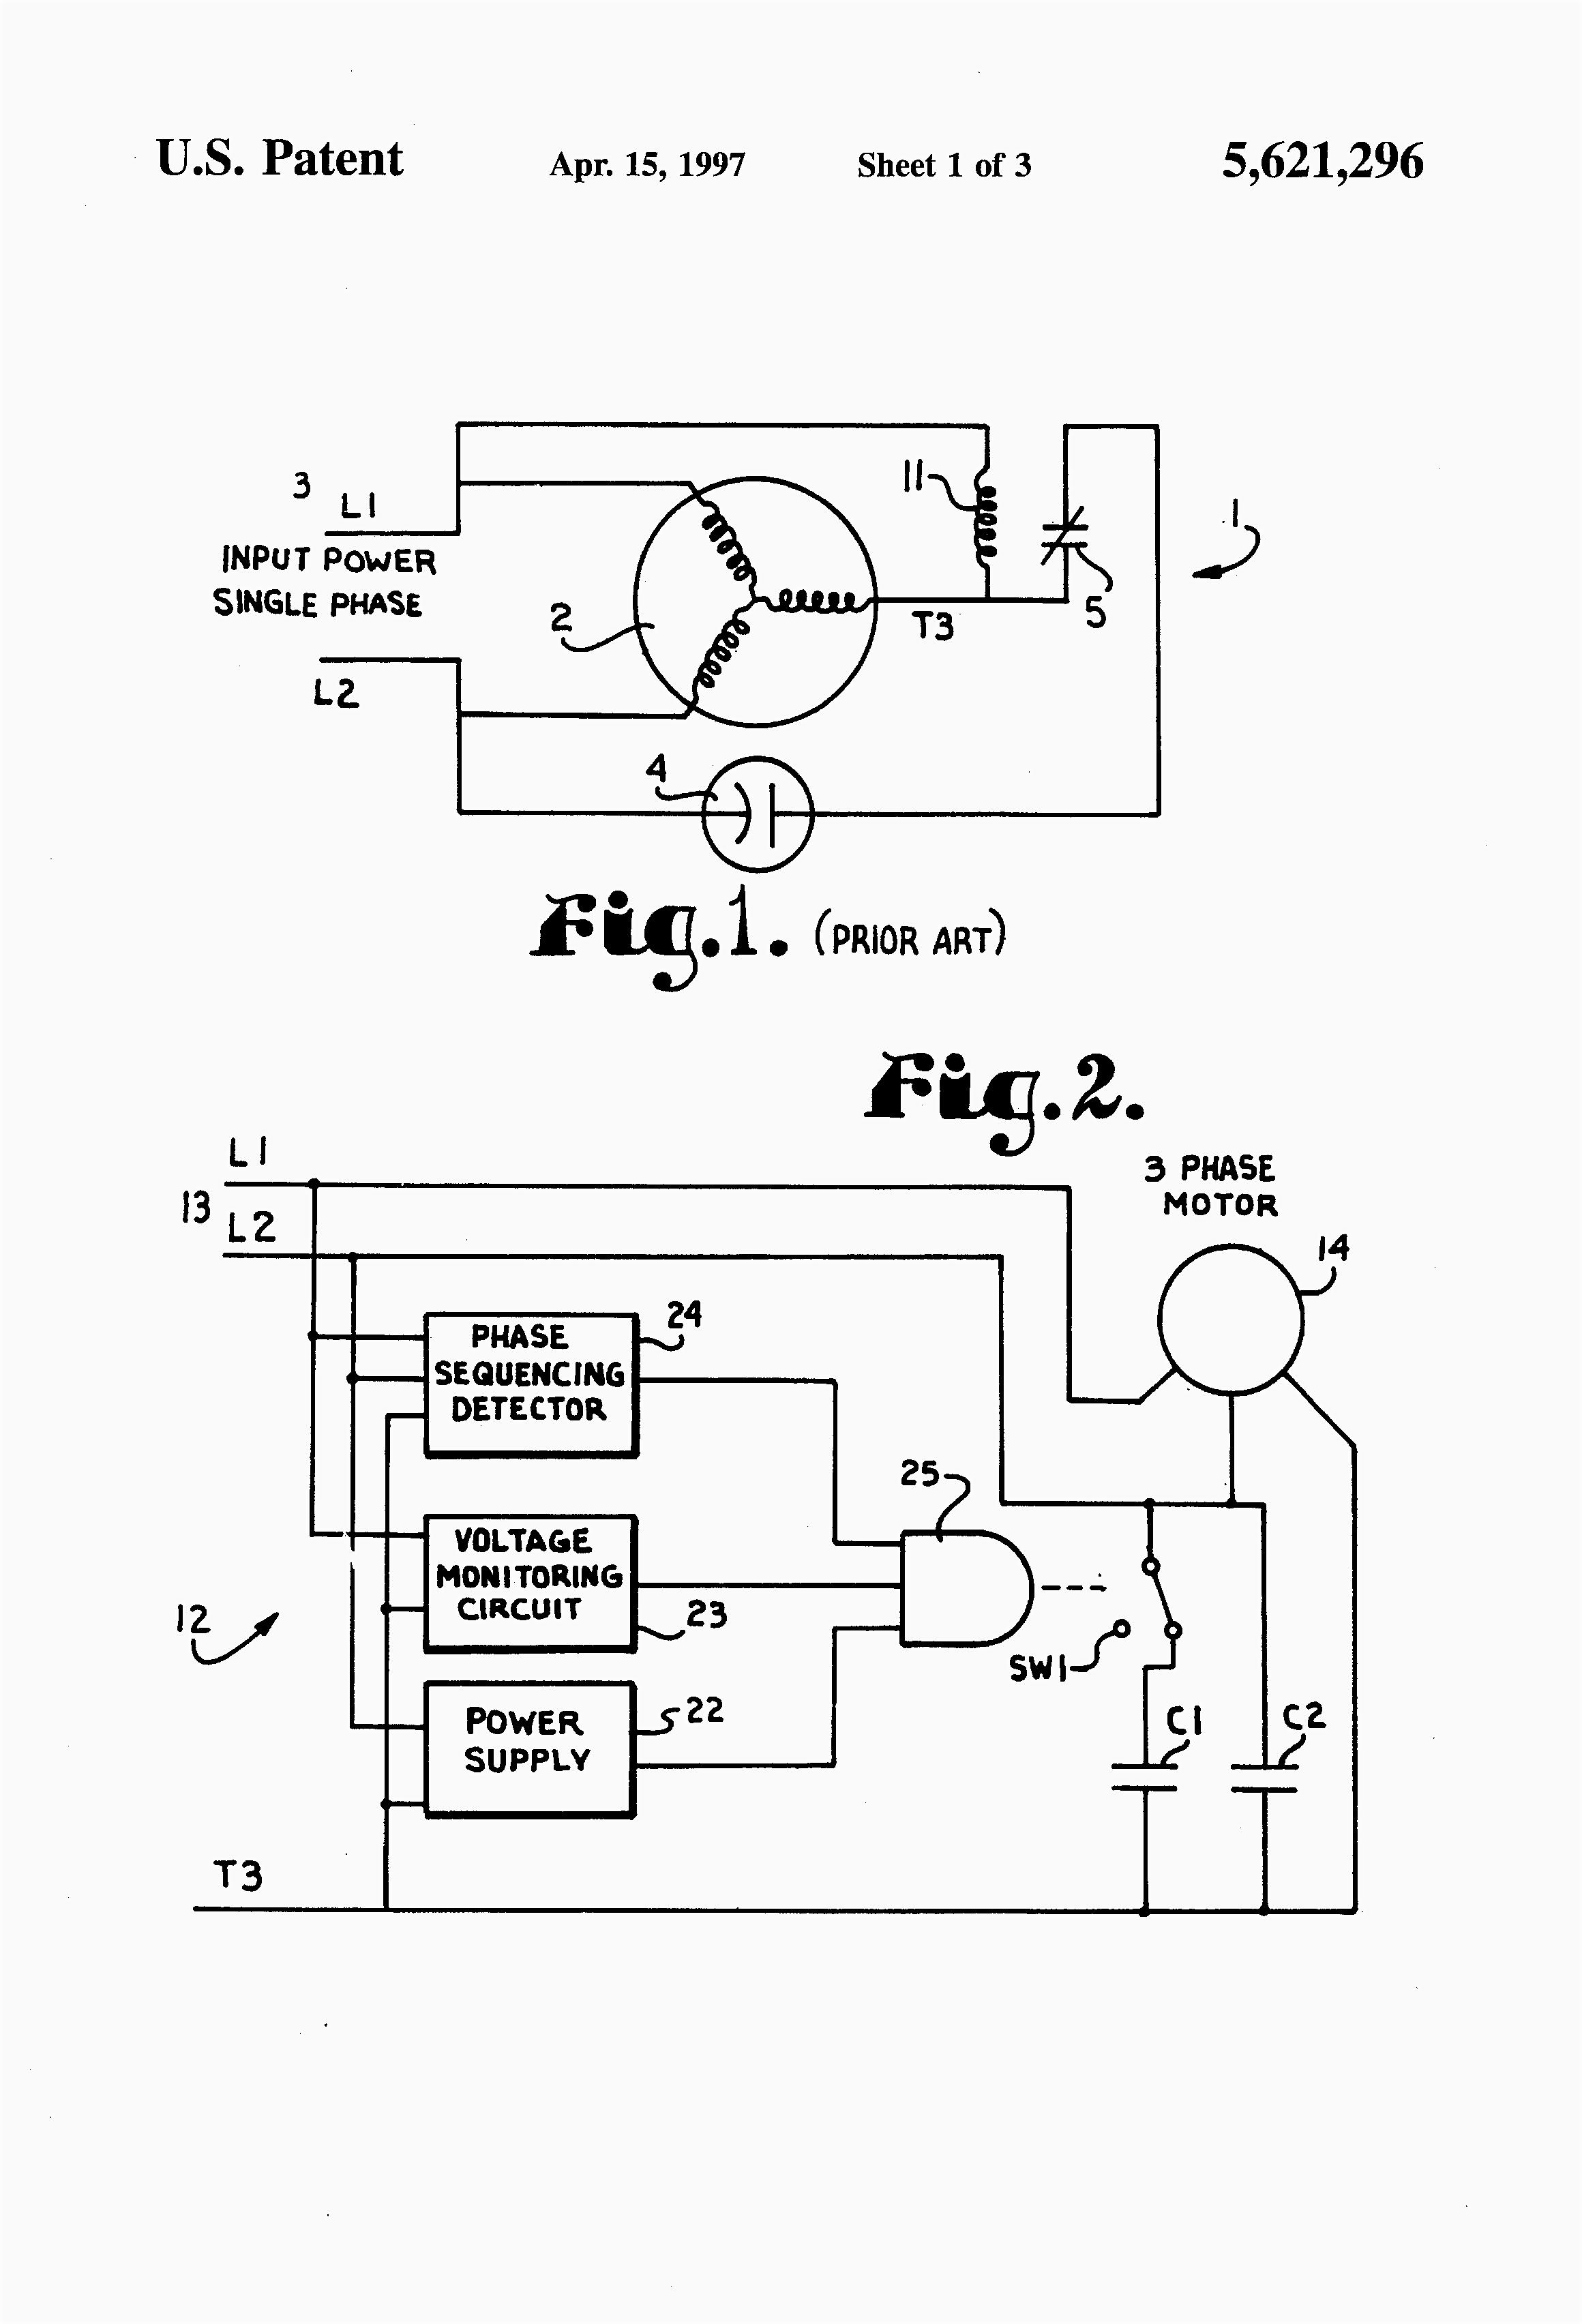 3 Phase Wiring Diagram L14 30 | Wiring Diagram - L14-30R Wiring Diagram